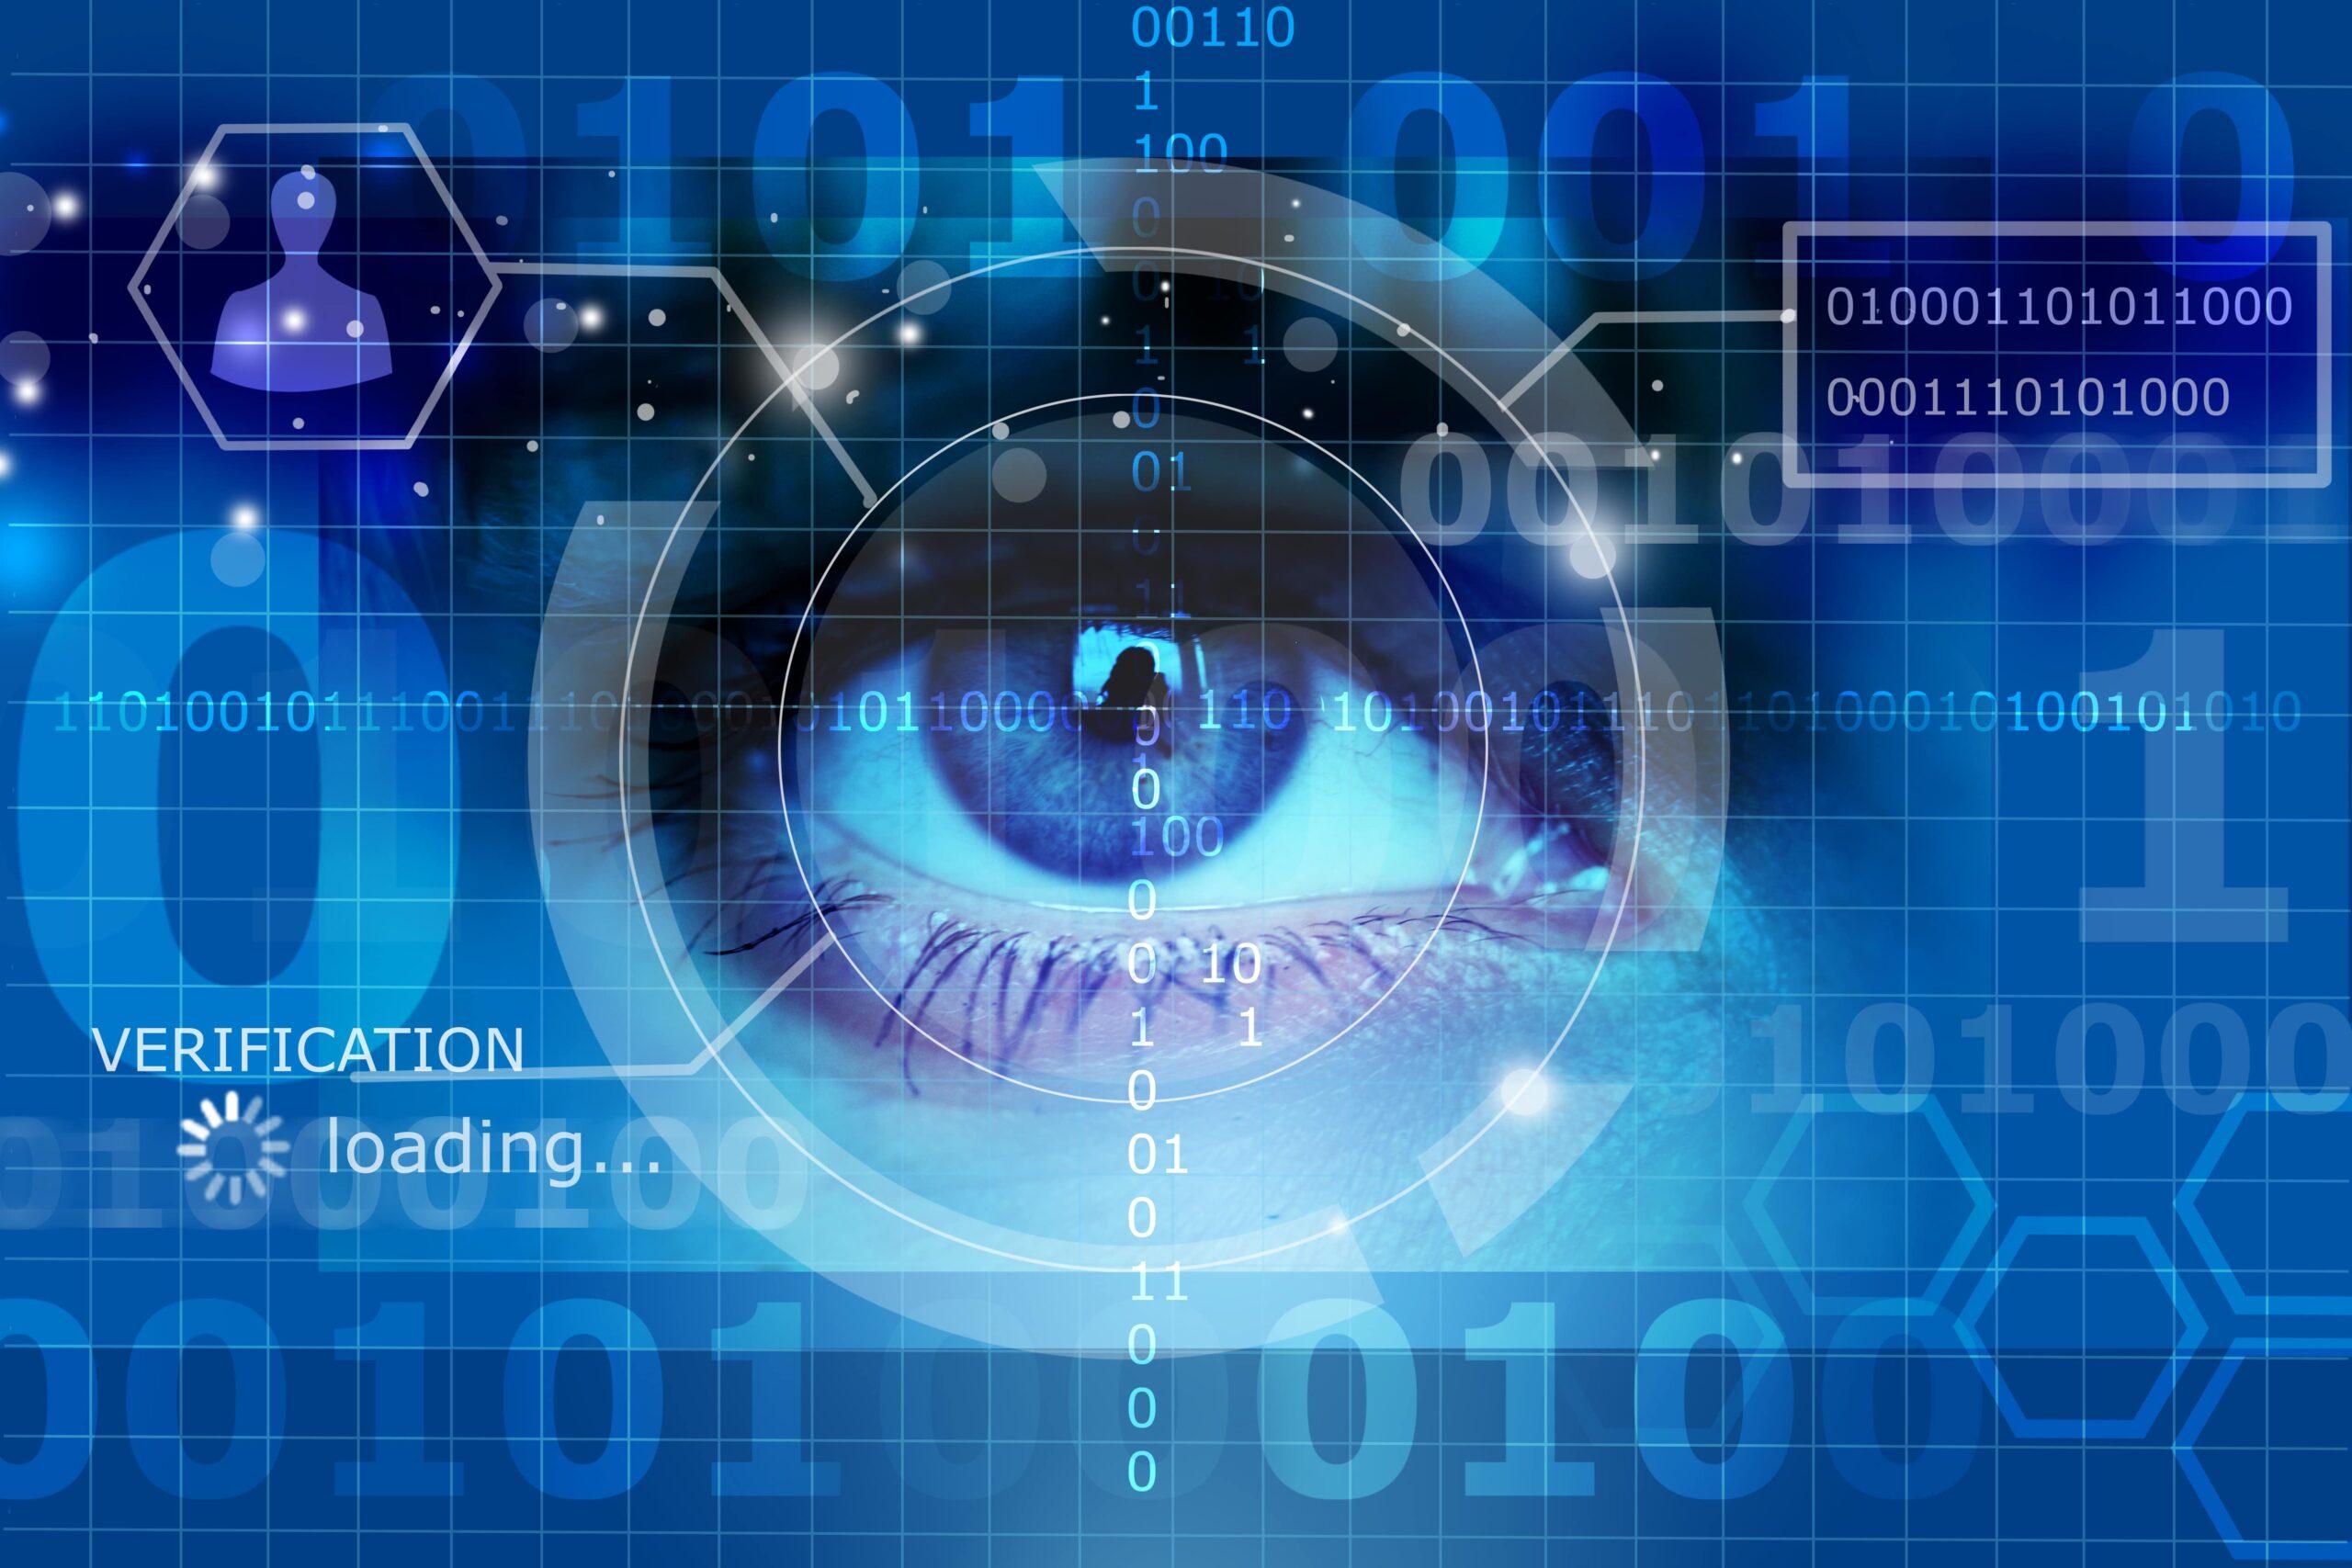 Cyber beveiligheid